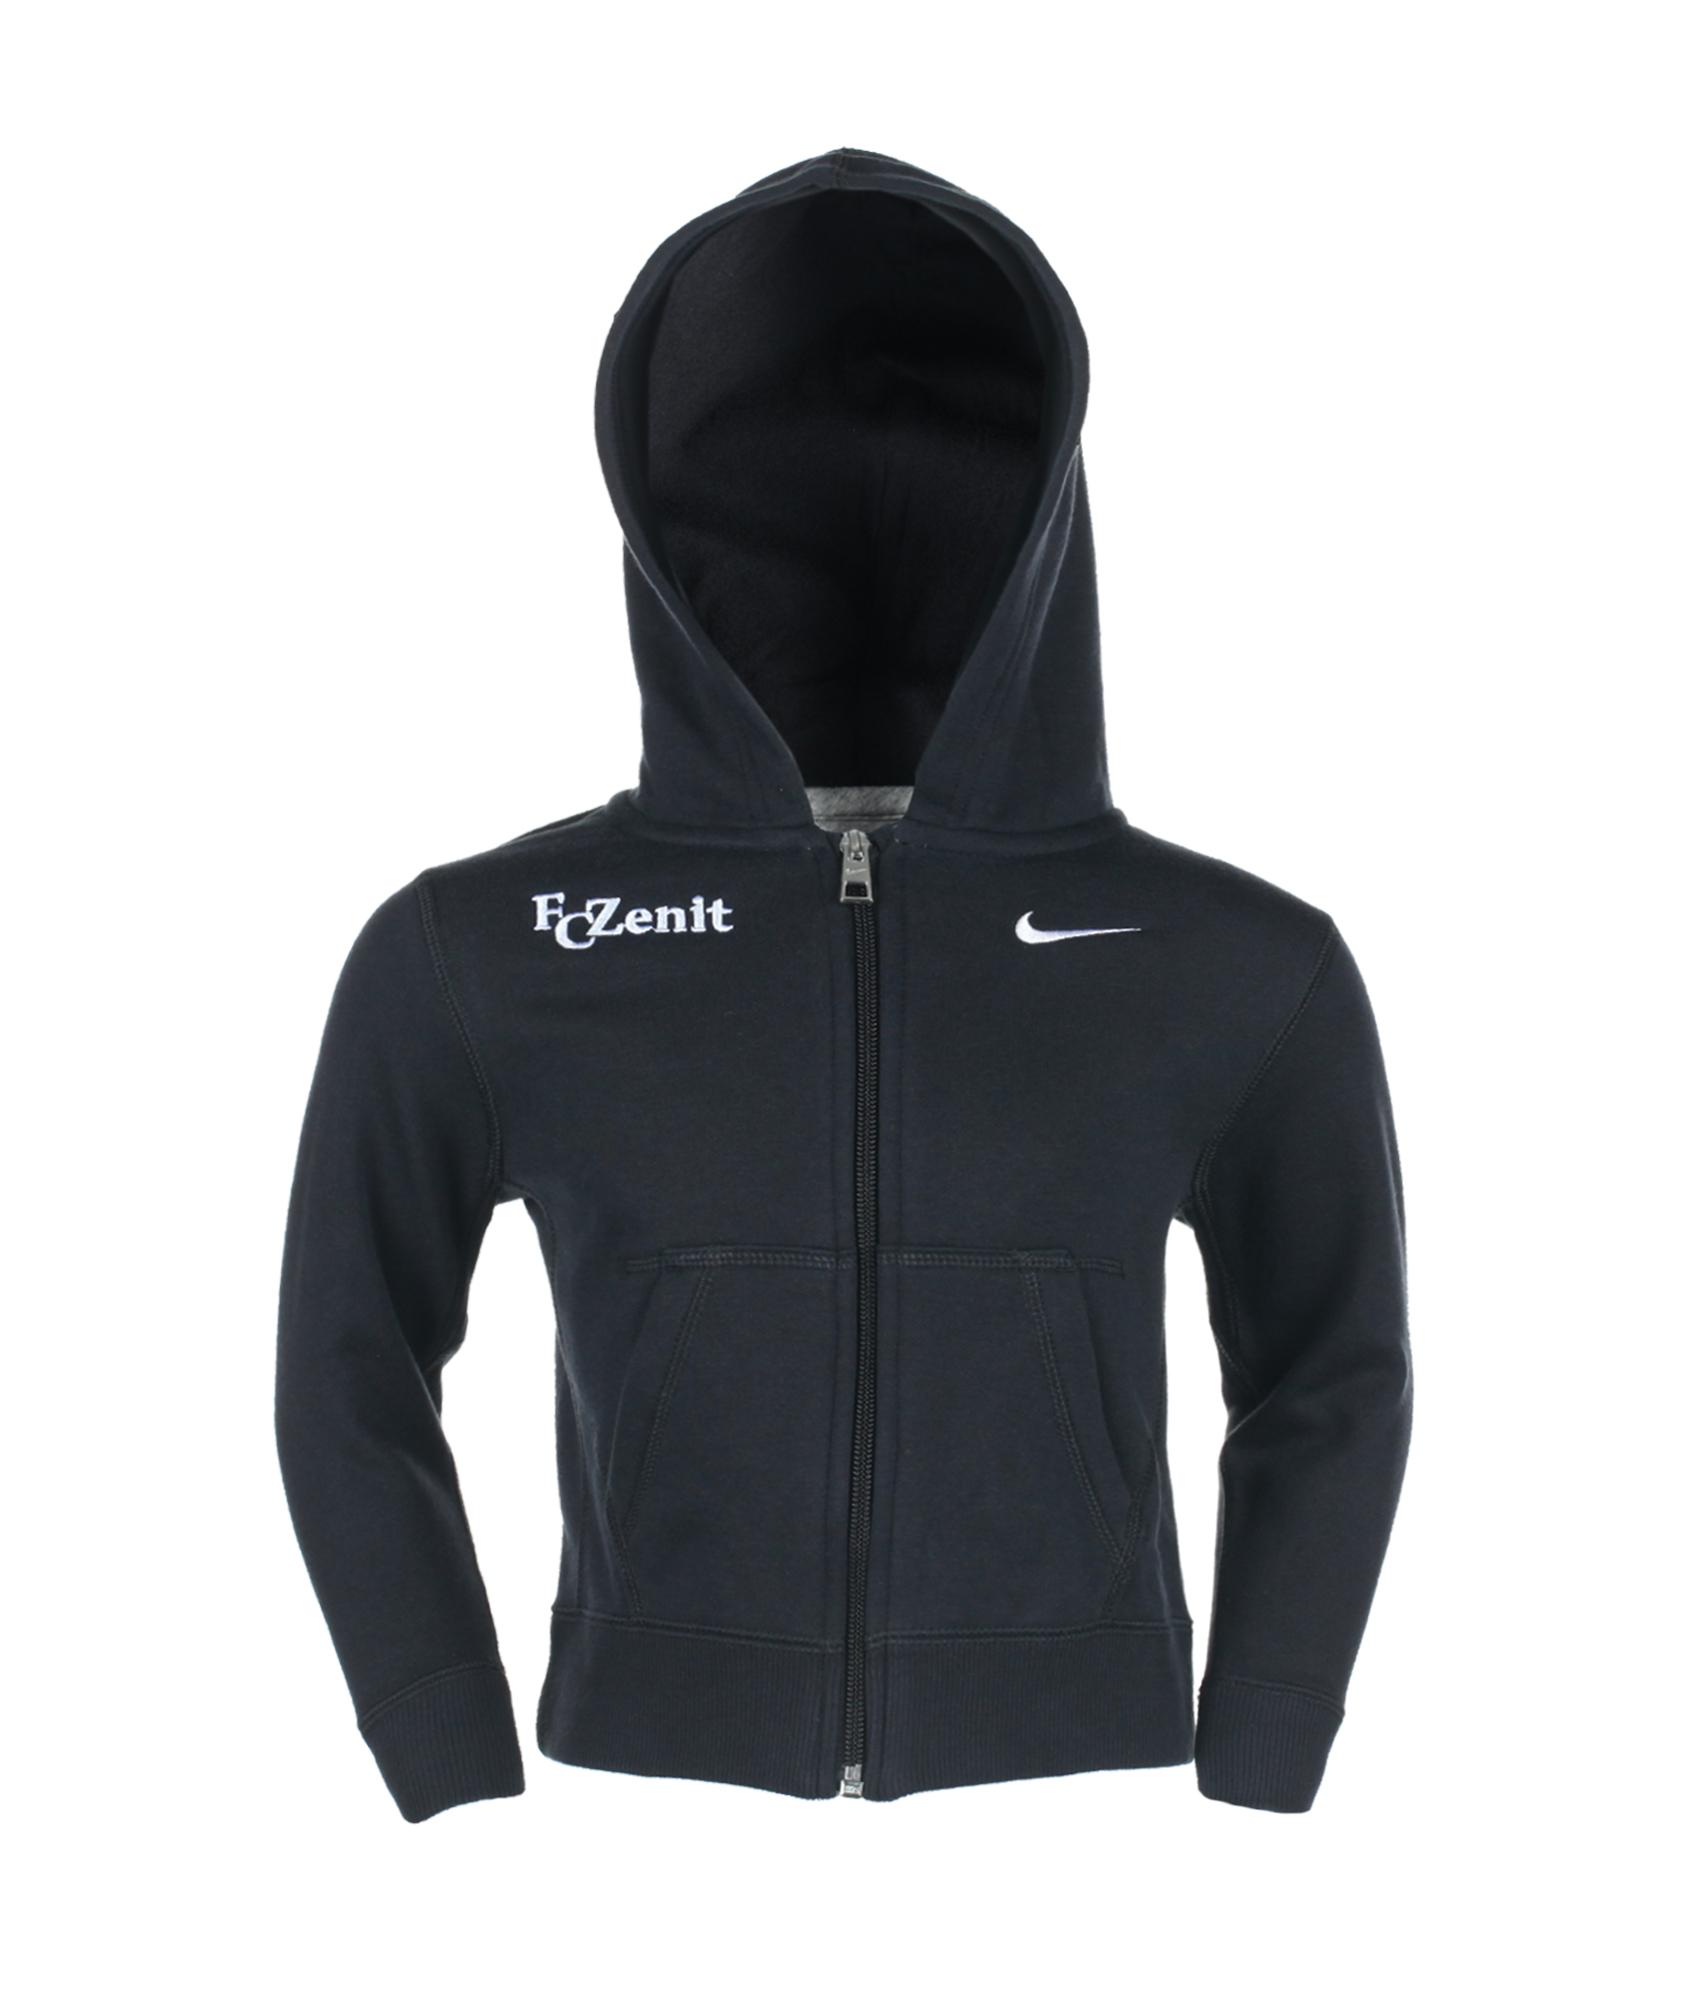 Толстовка Nike YA76 BF FZ HOODY, Цвет-Черный, Размер-S